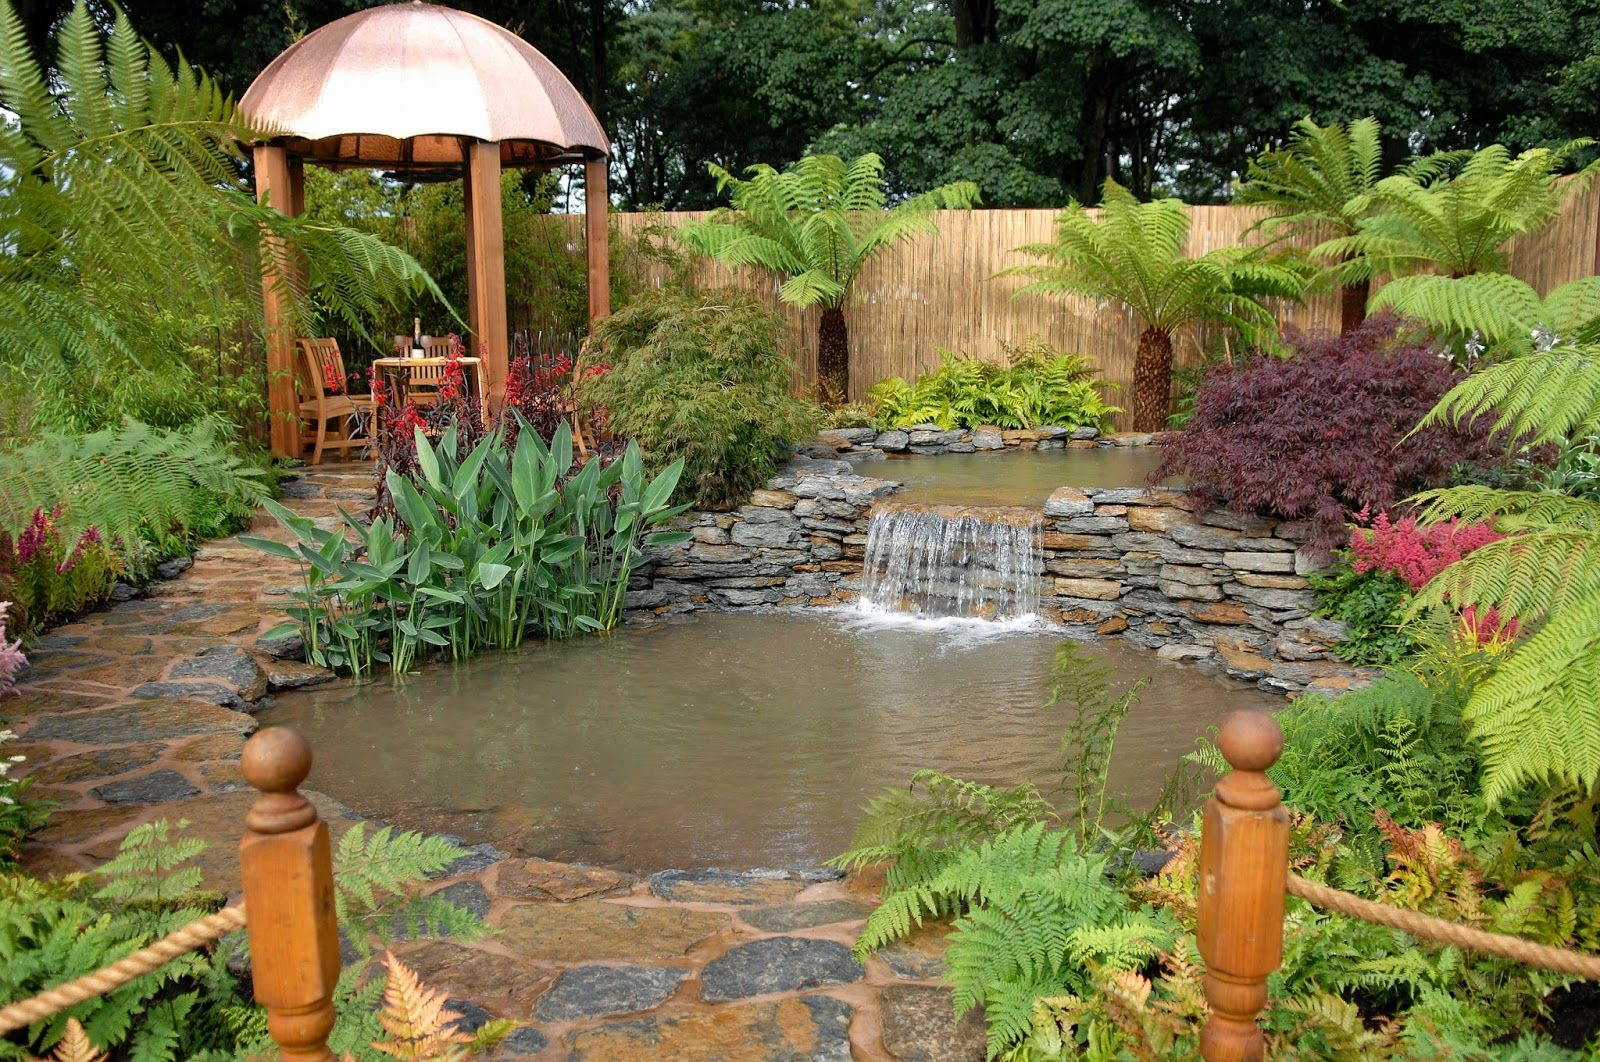 Arte y jardiner a dise o de jardines dise o de jardines for Estanques de agua para jardin